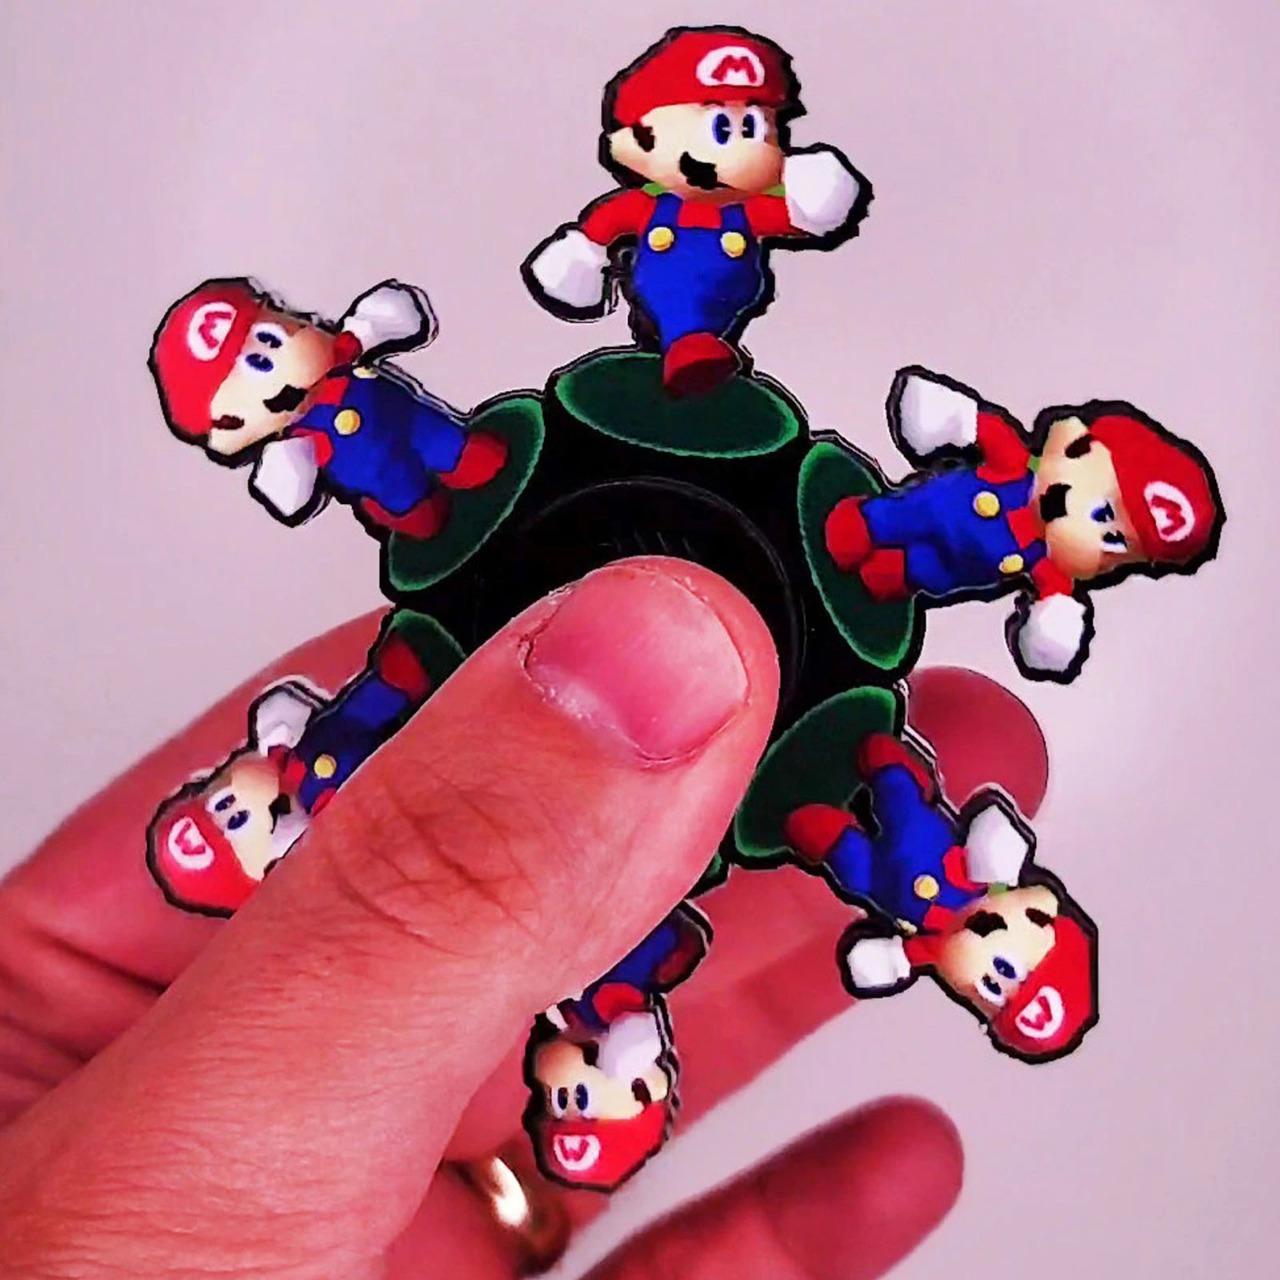 Hand Spinner Motion Mario: Super Mario 64 - Rolamento Anti Estresse Fidget Hand Spinner - EVALI